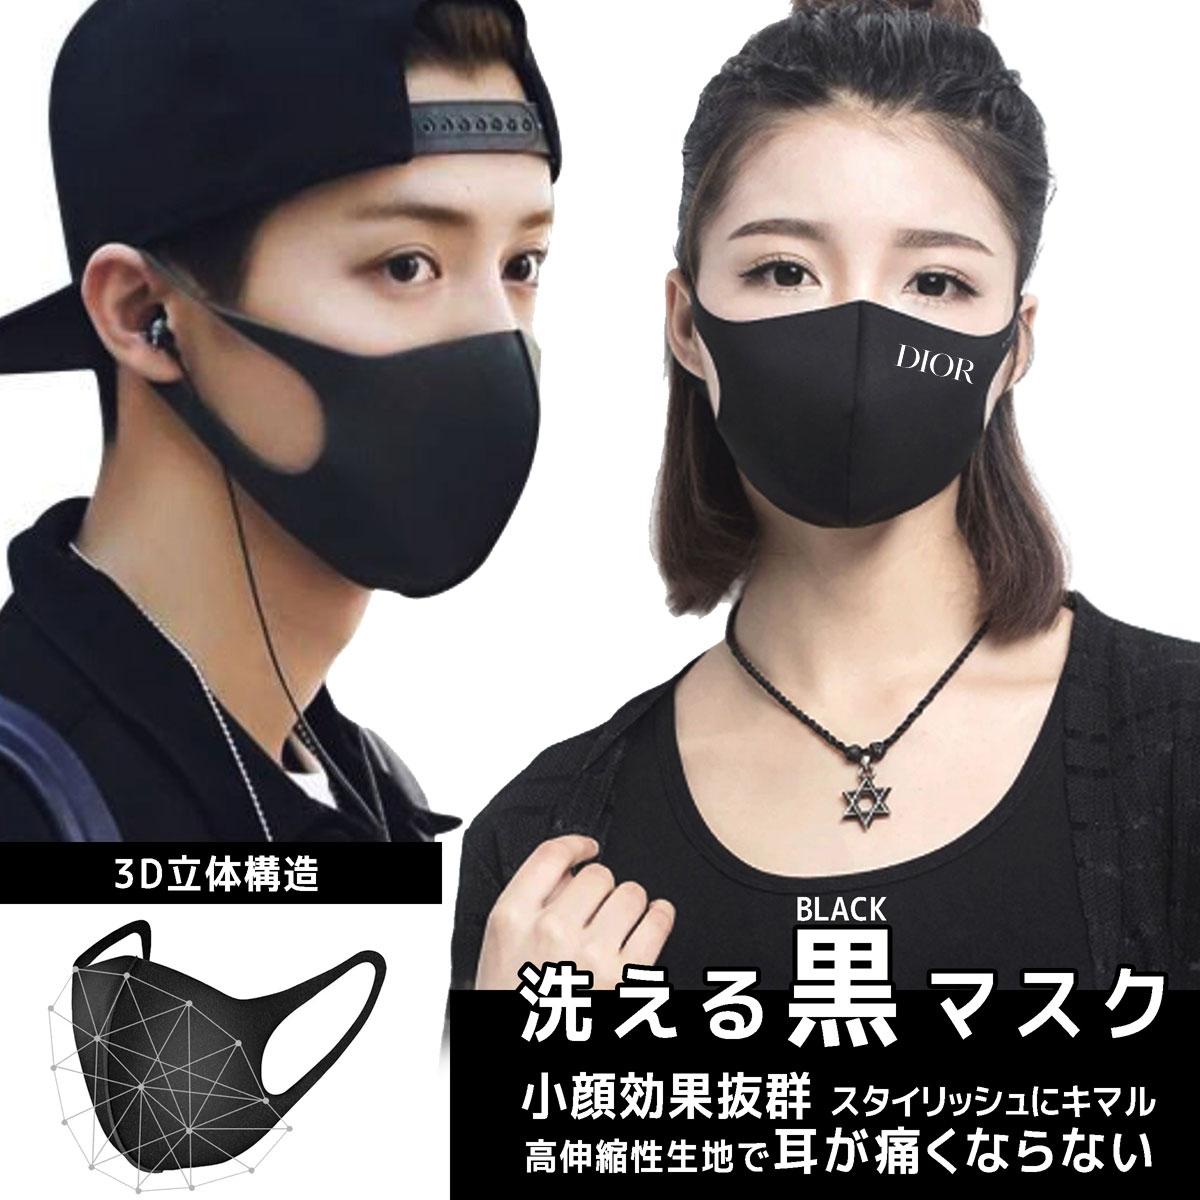 Reusable face protector Dior brand masks